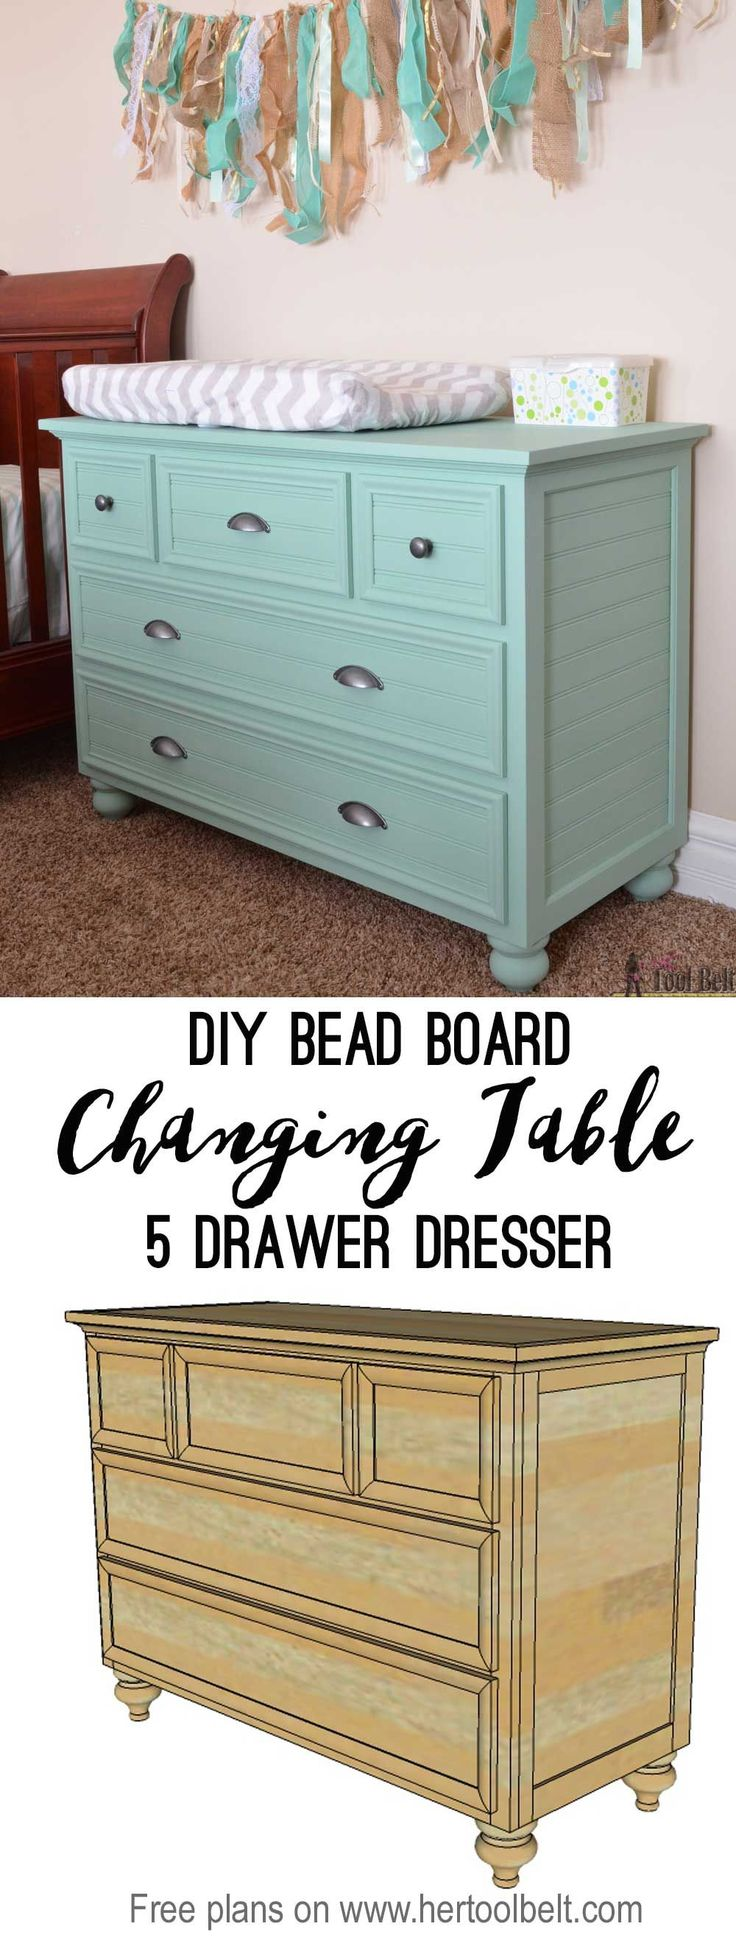 25 best ideas about changing table dresser on pinterest baby nursery organization nursery. Black Bedroom Furniture Sets. Home Design Ideas